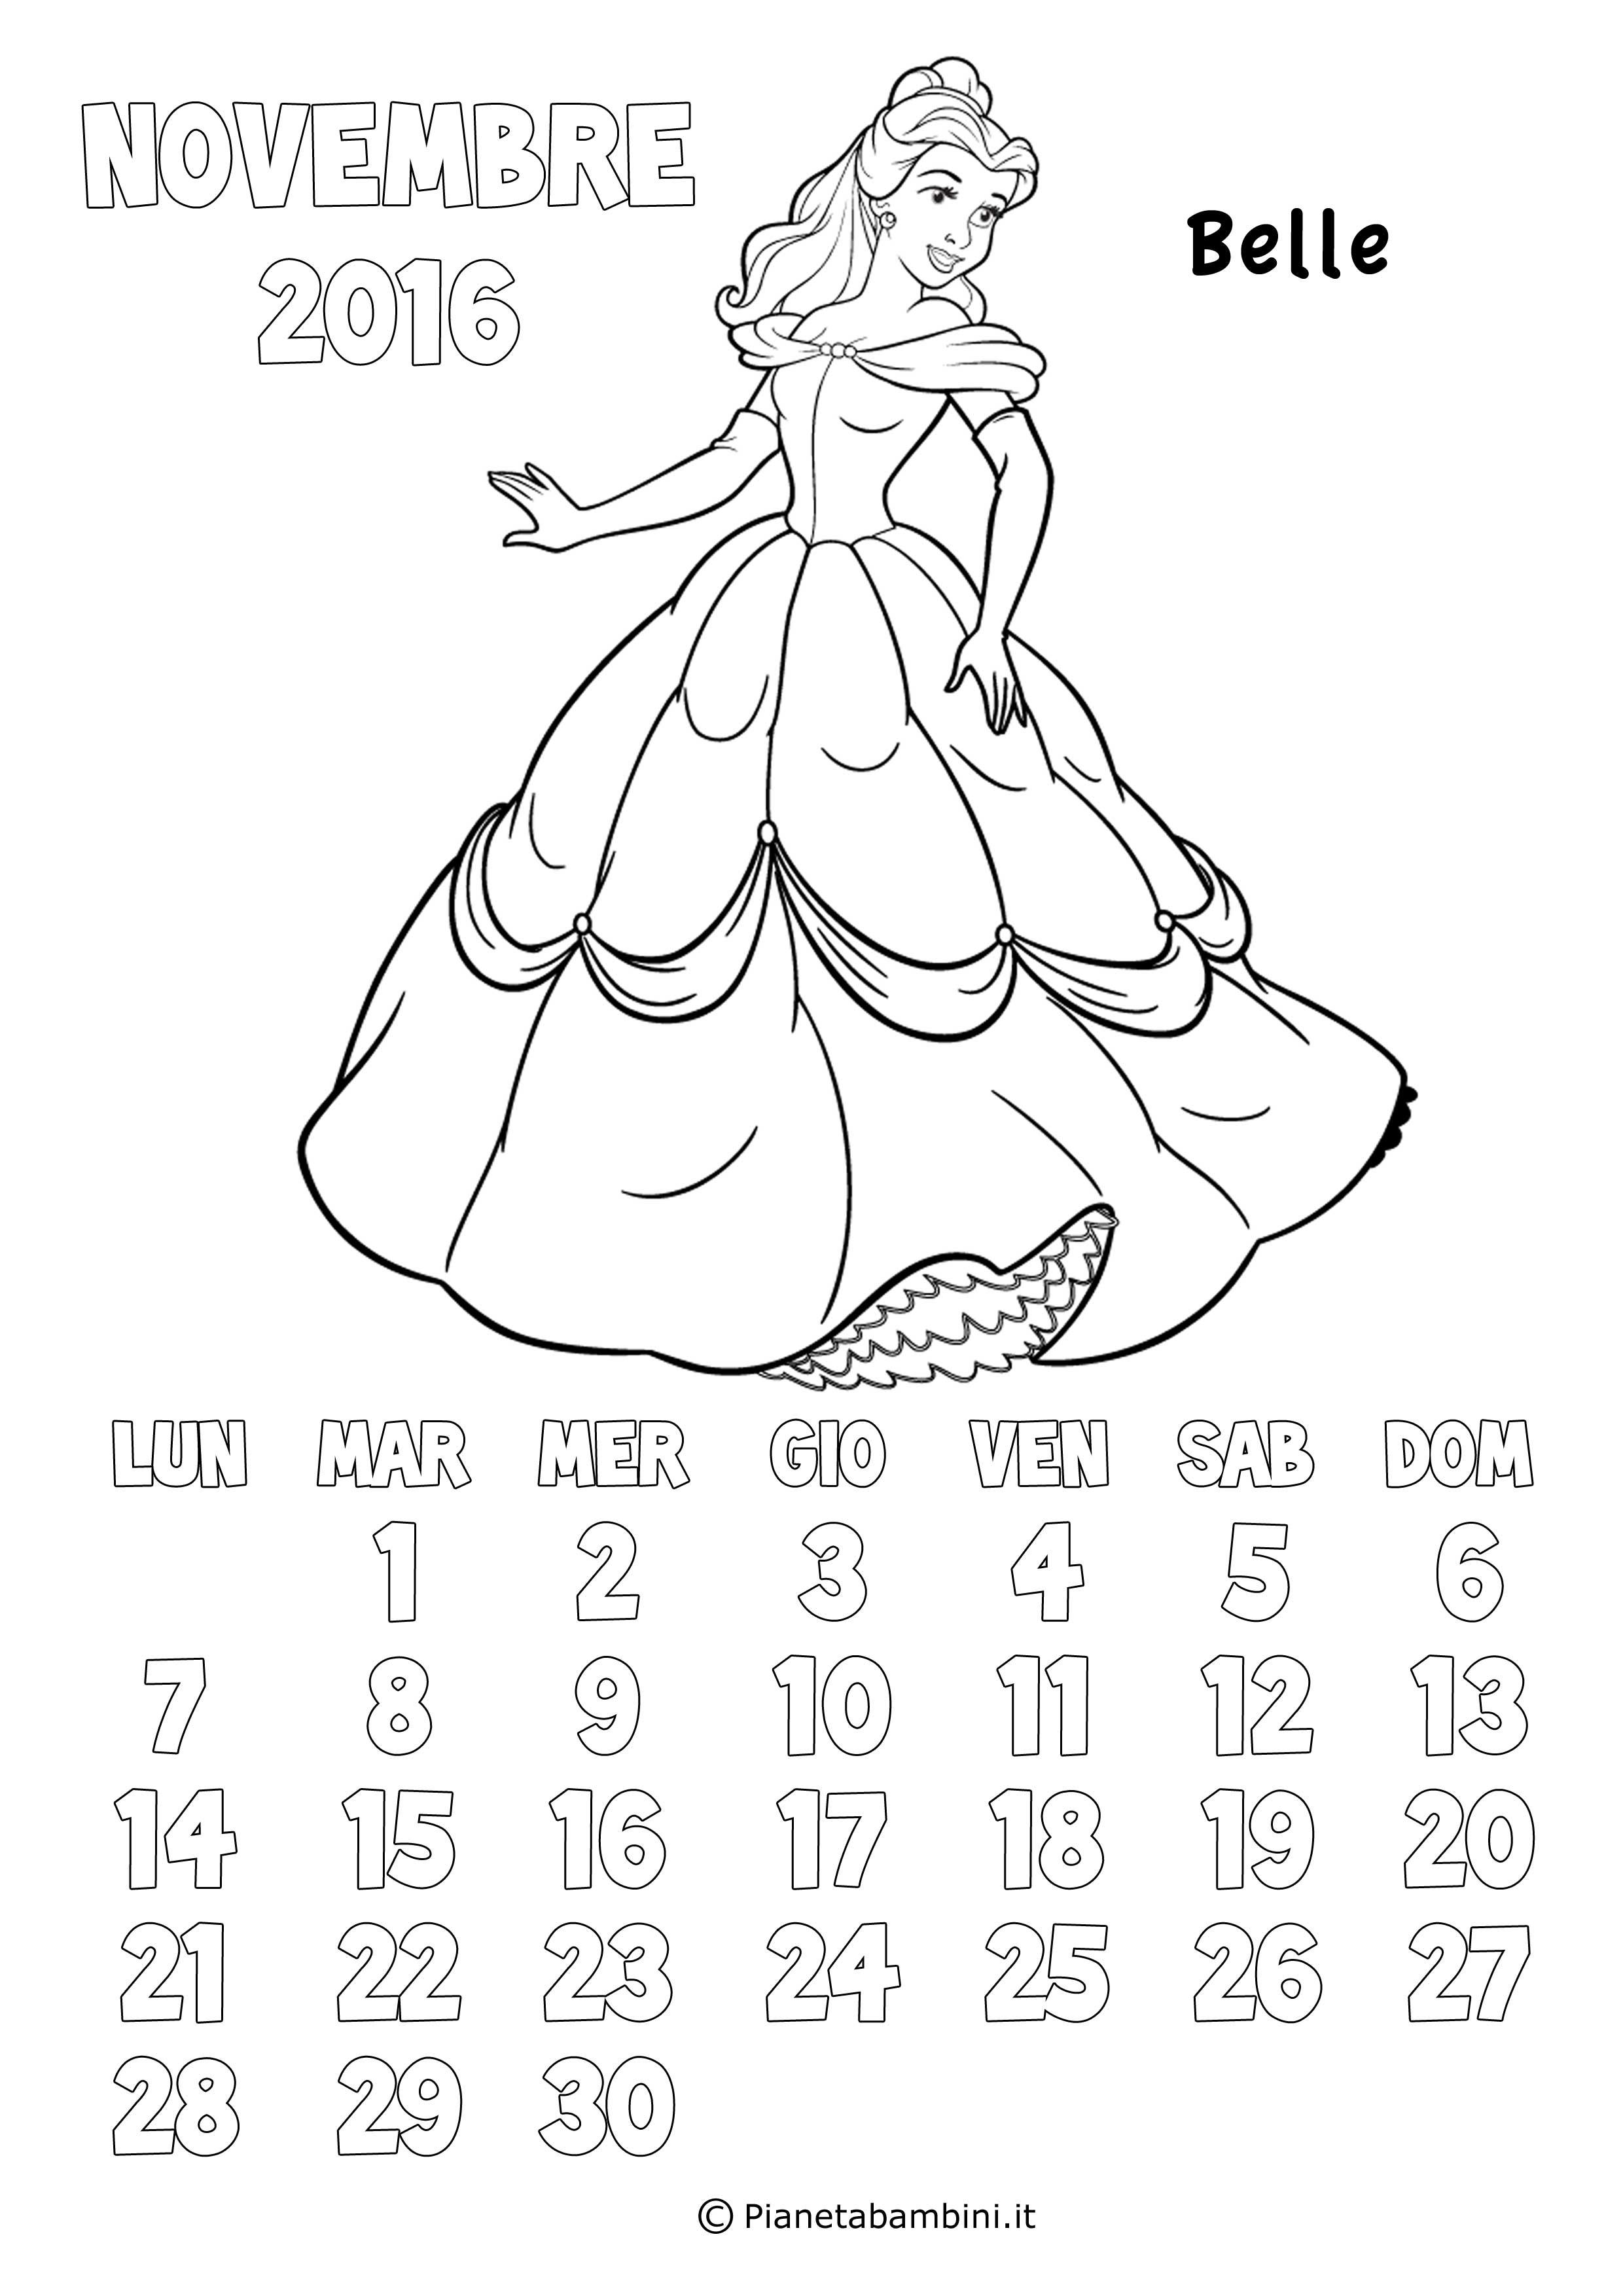 Novembre-2016-Belle